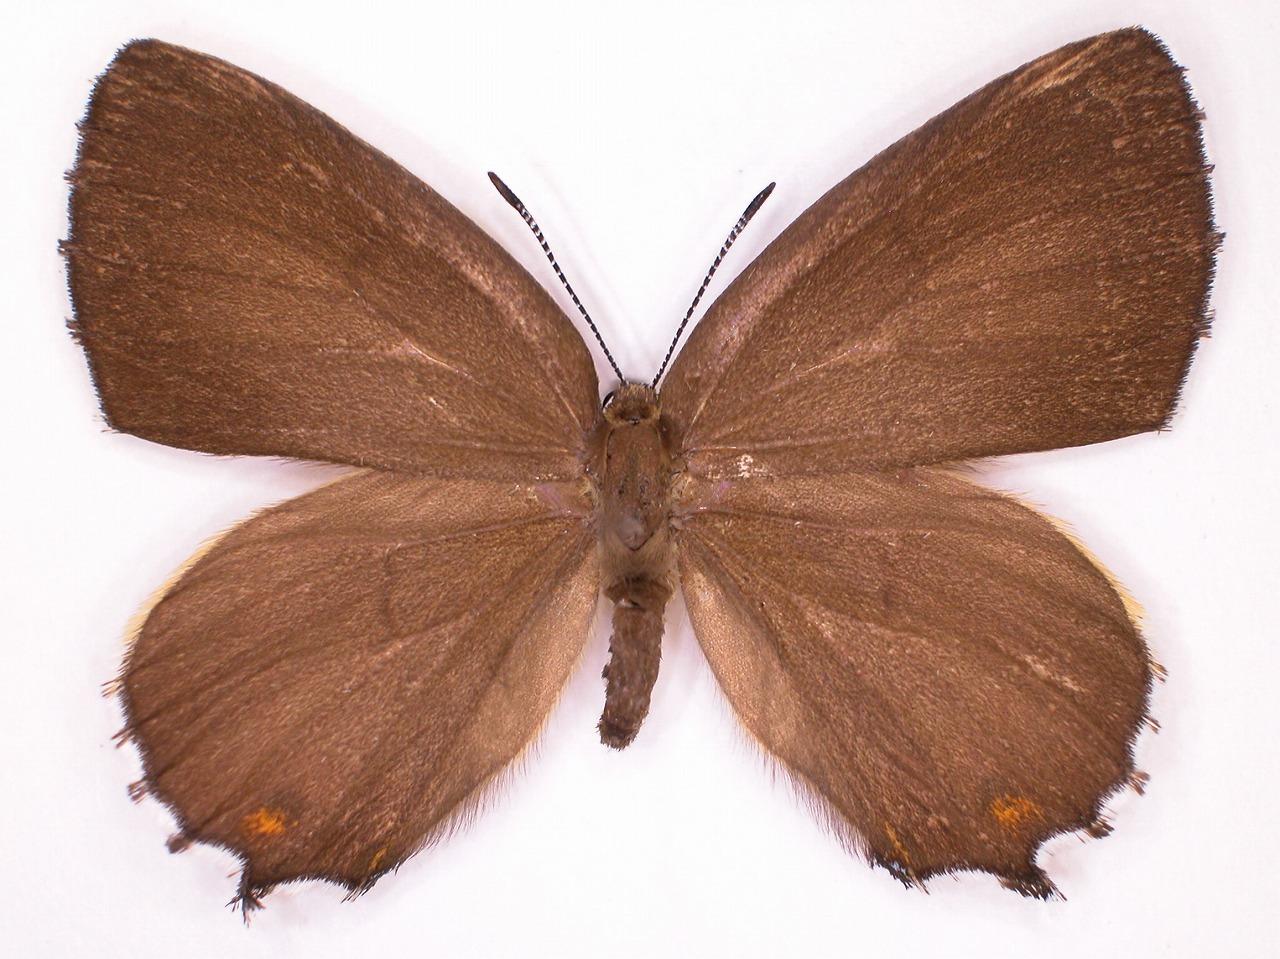 https://www.hitohaku.jp/material/l-material/butterfly-wing/5-lycaenidae/B1-637770_A.jpg